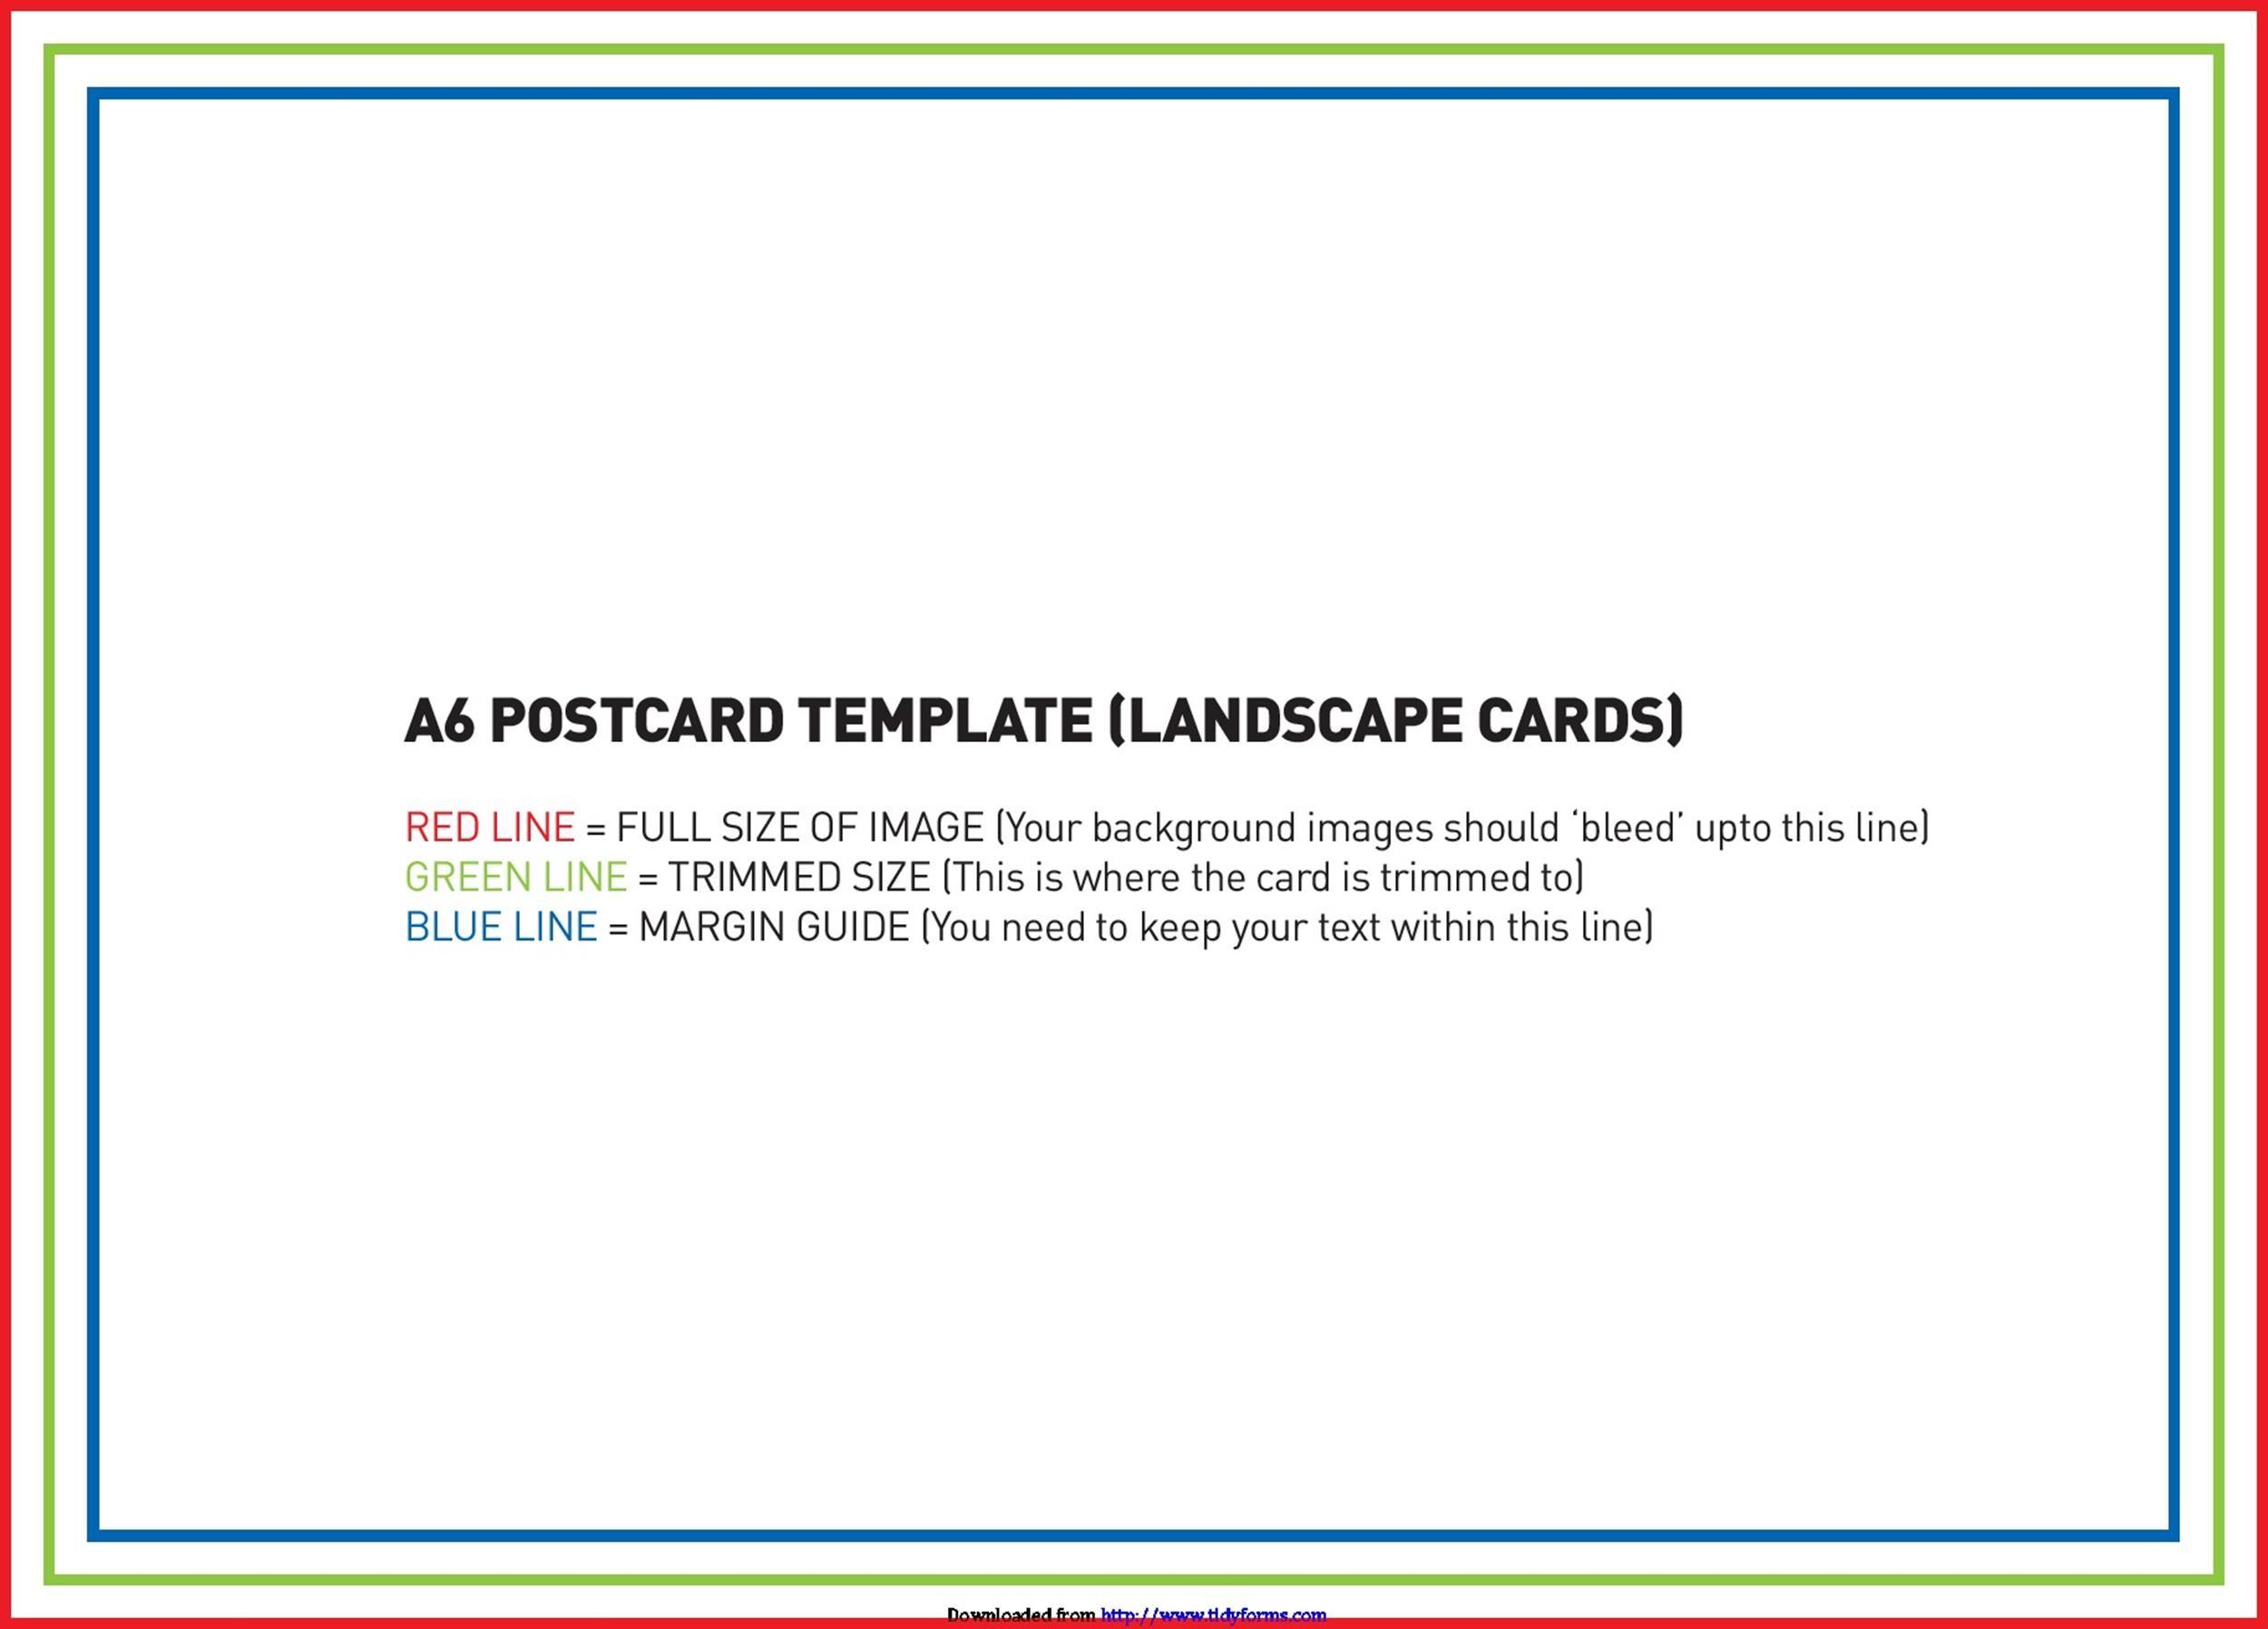 40+ Great Postcard Templates  Designs Word + PDF - Template Lab